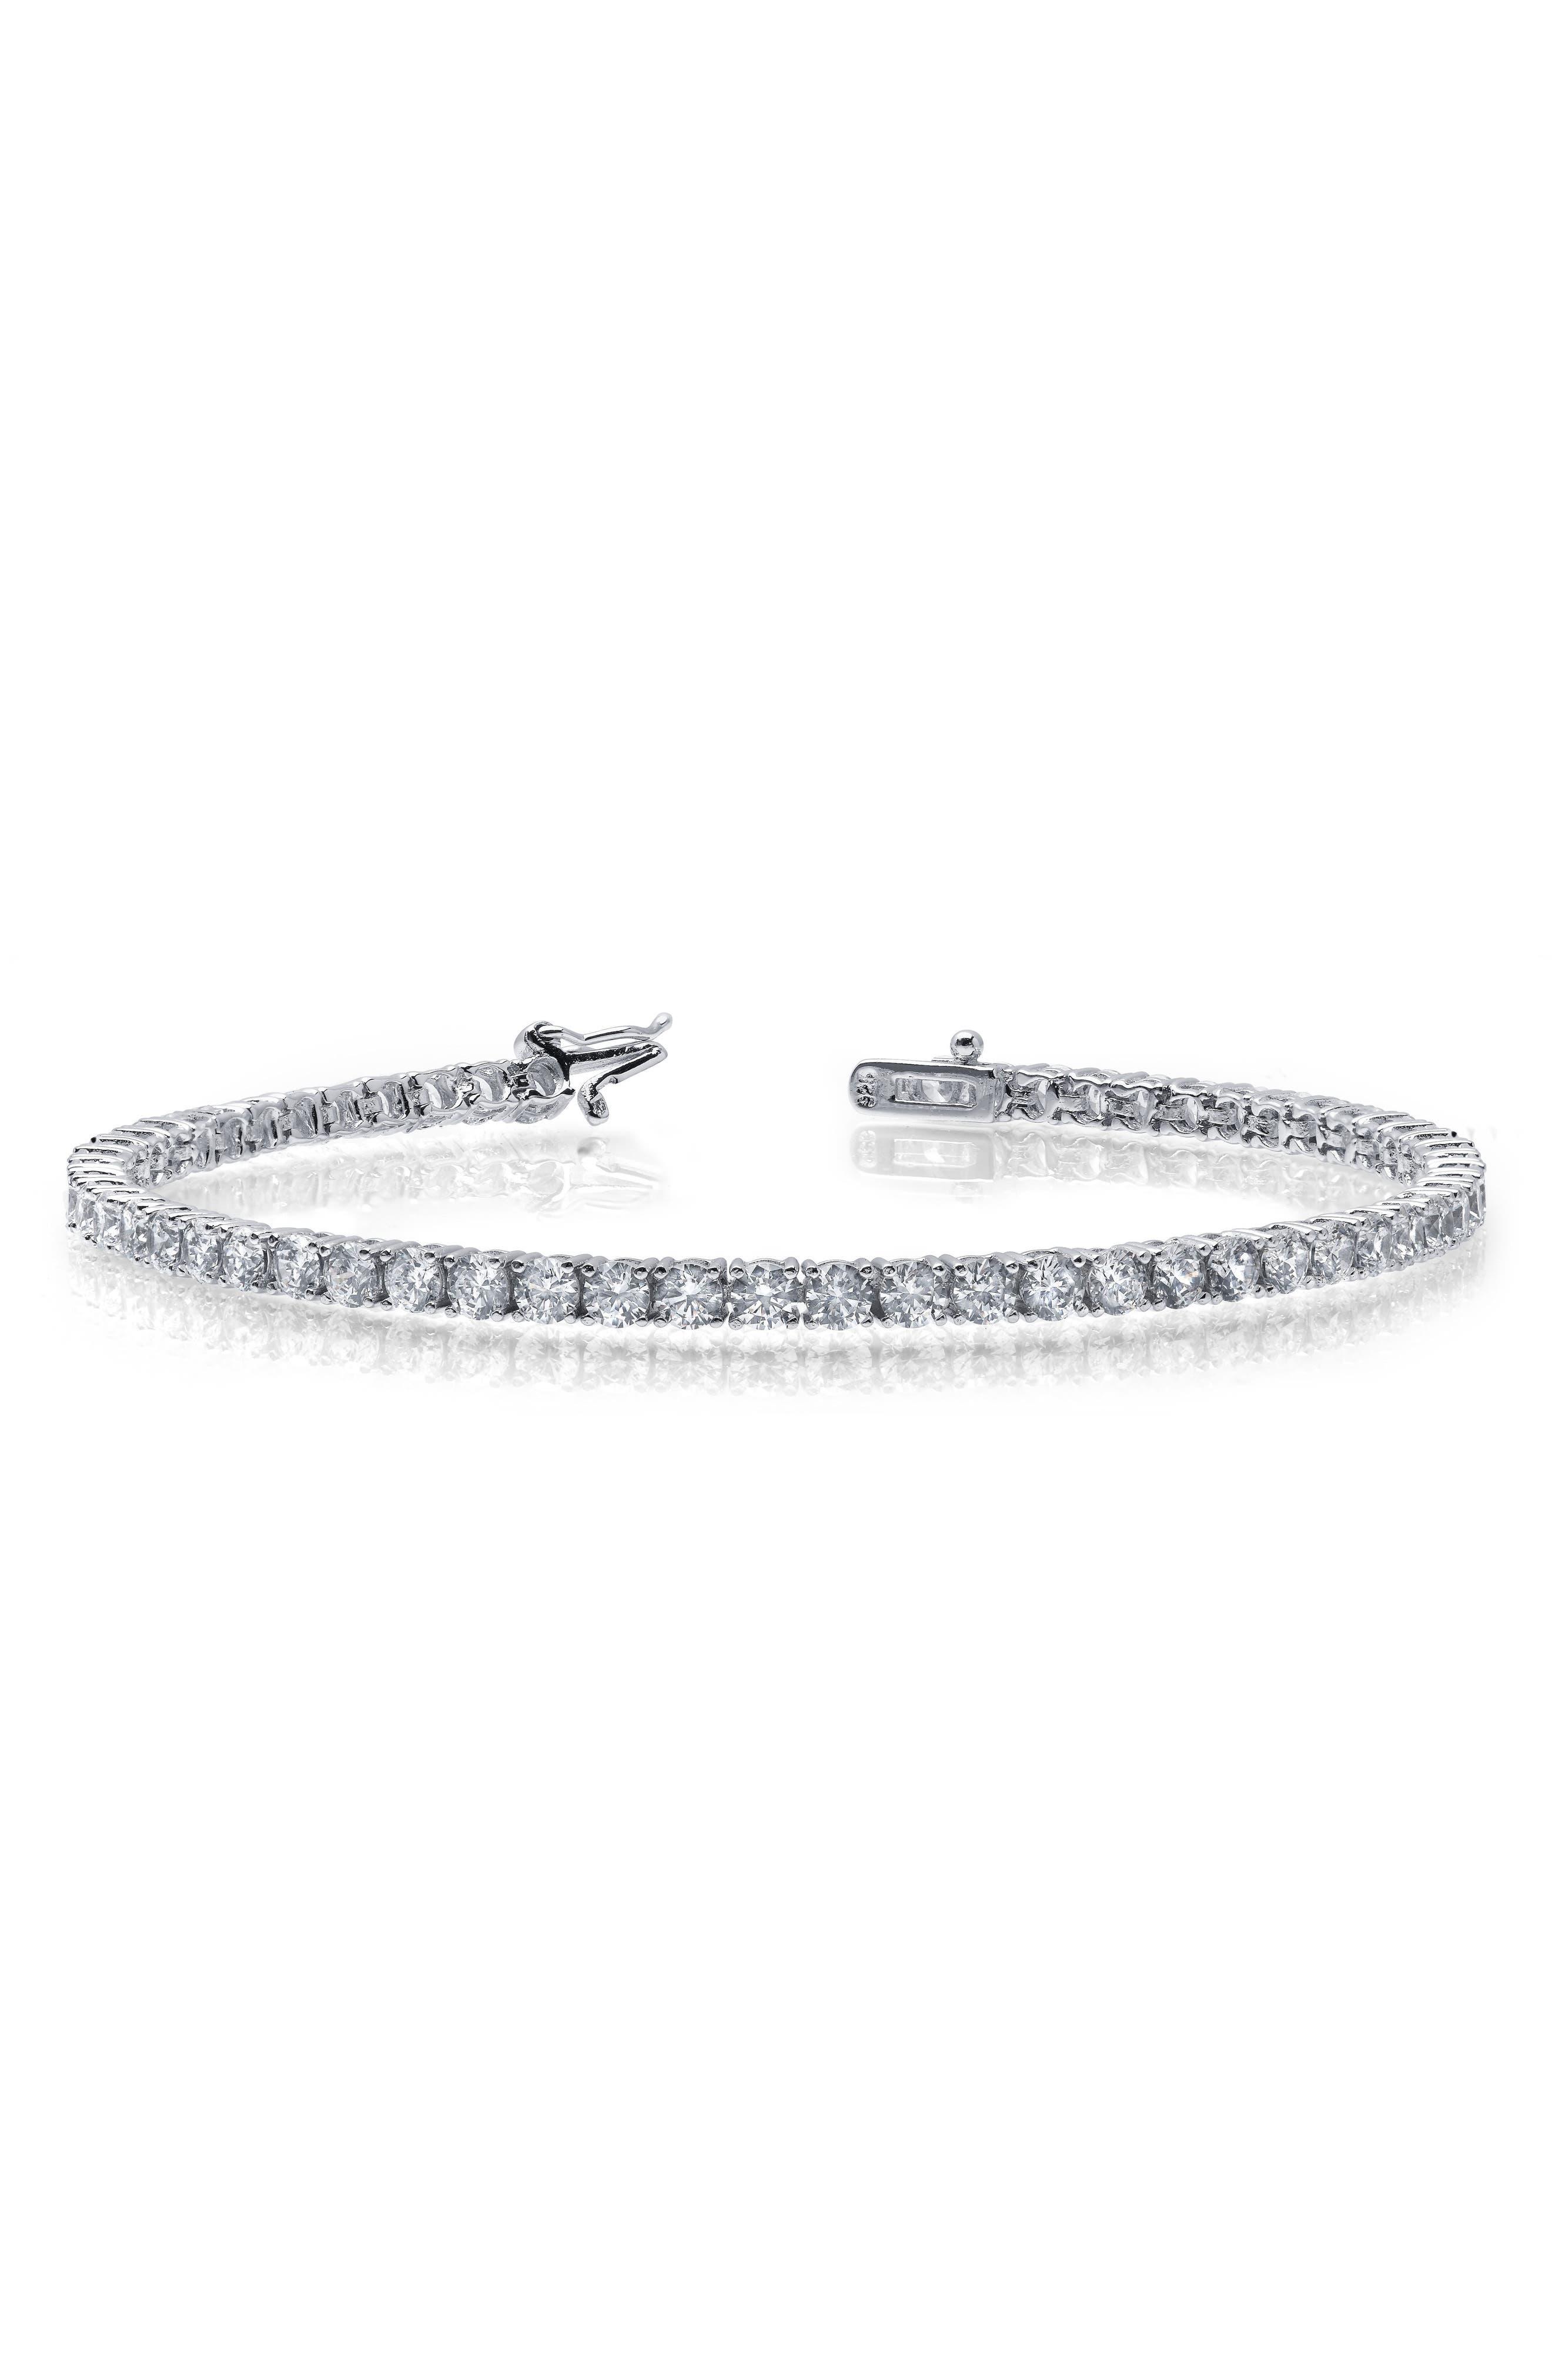 Simulated Diamond Bracelet